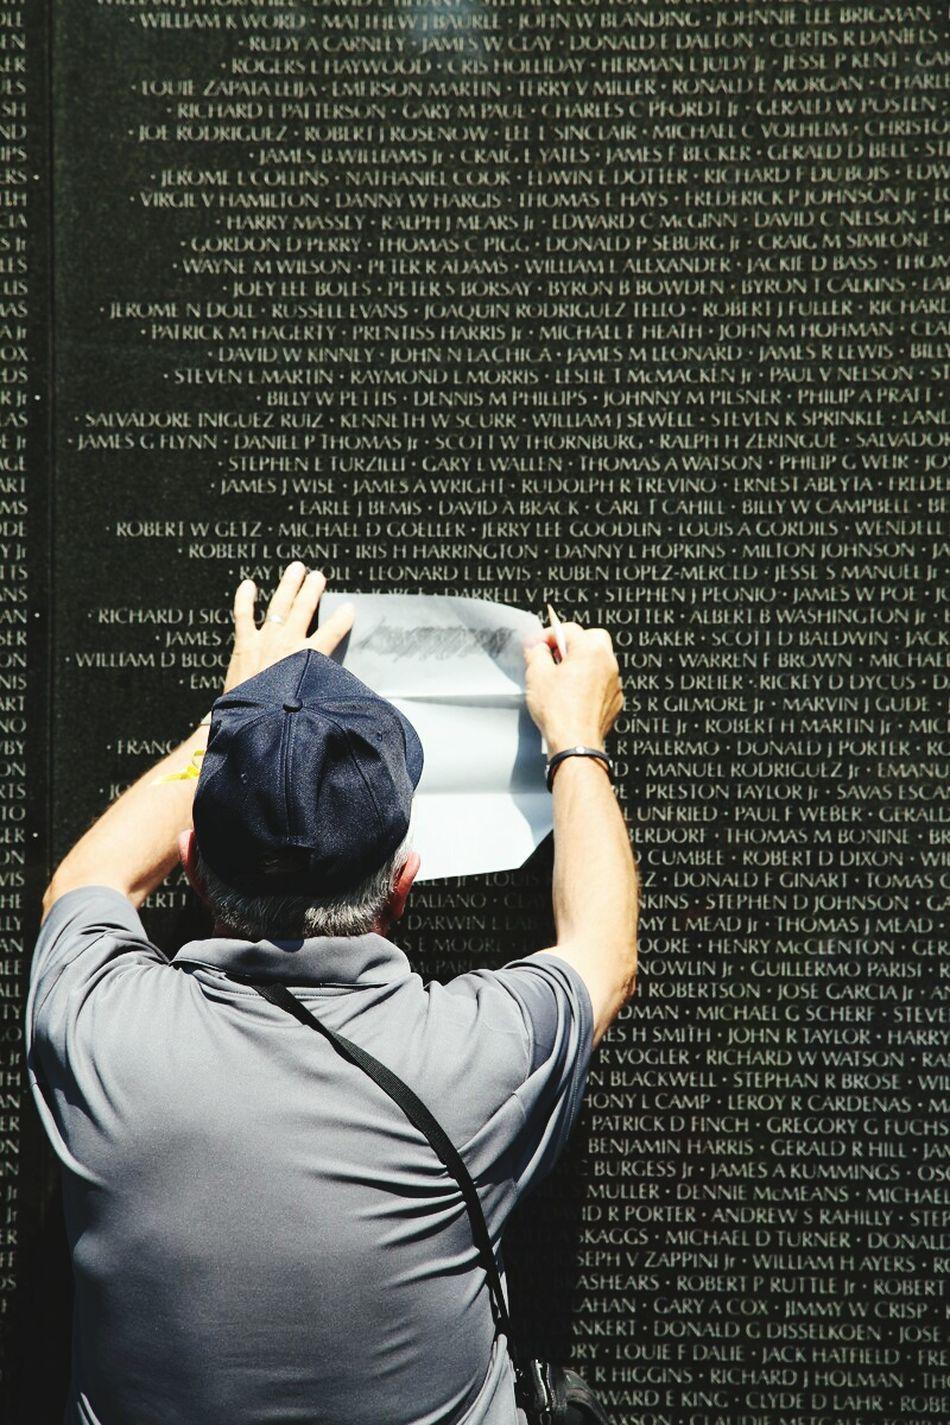 Veterans Day Reflection Memorial One Person Men Adult Veterans Memorial Pencil And Paper Impressions